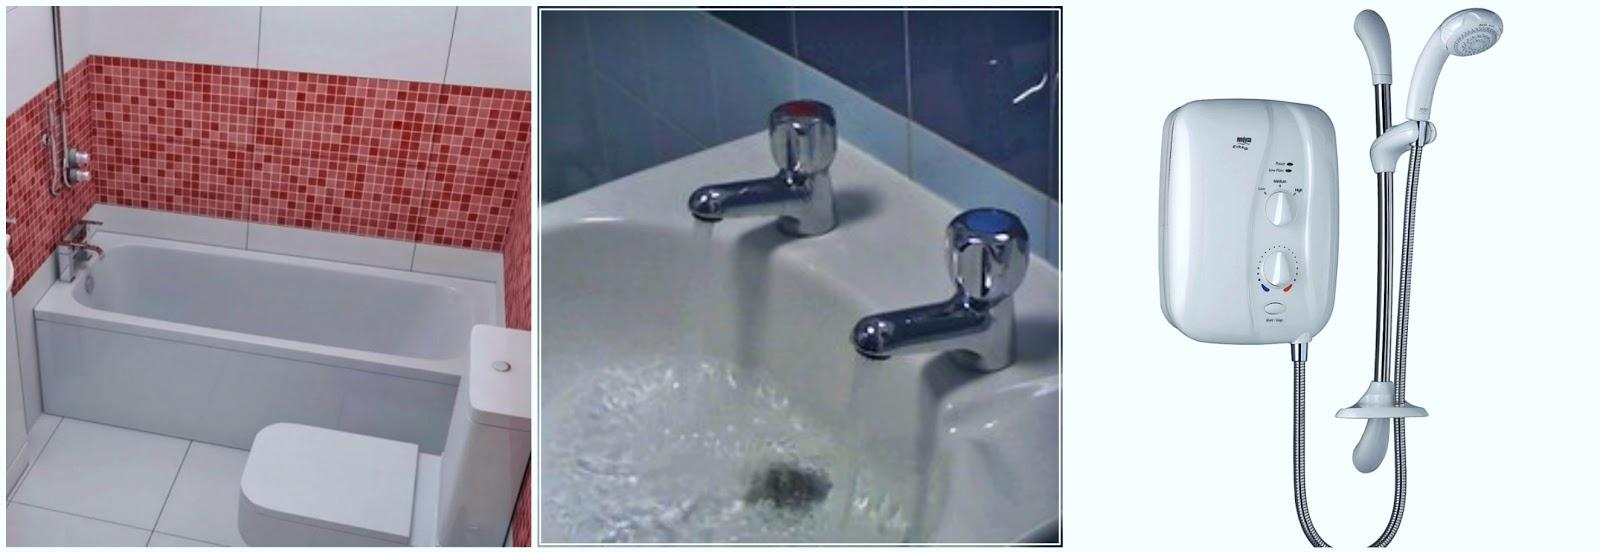 banheiros na irlanda